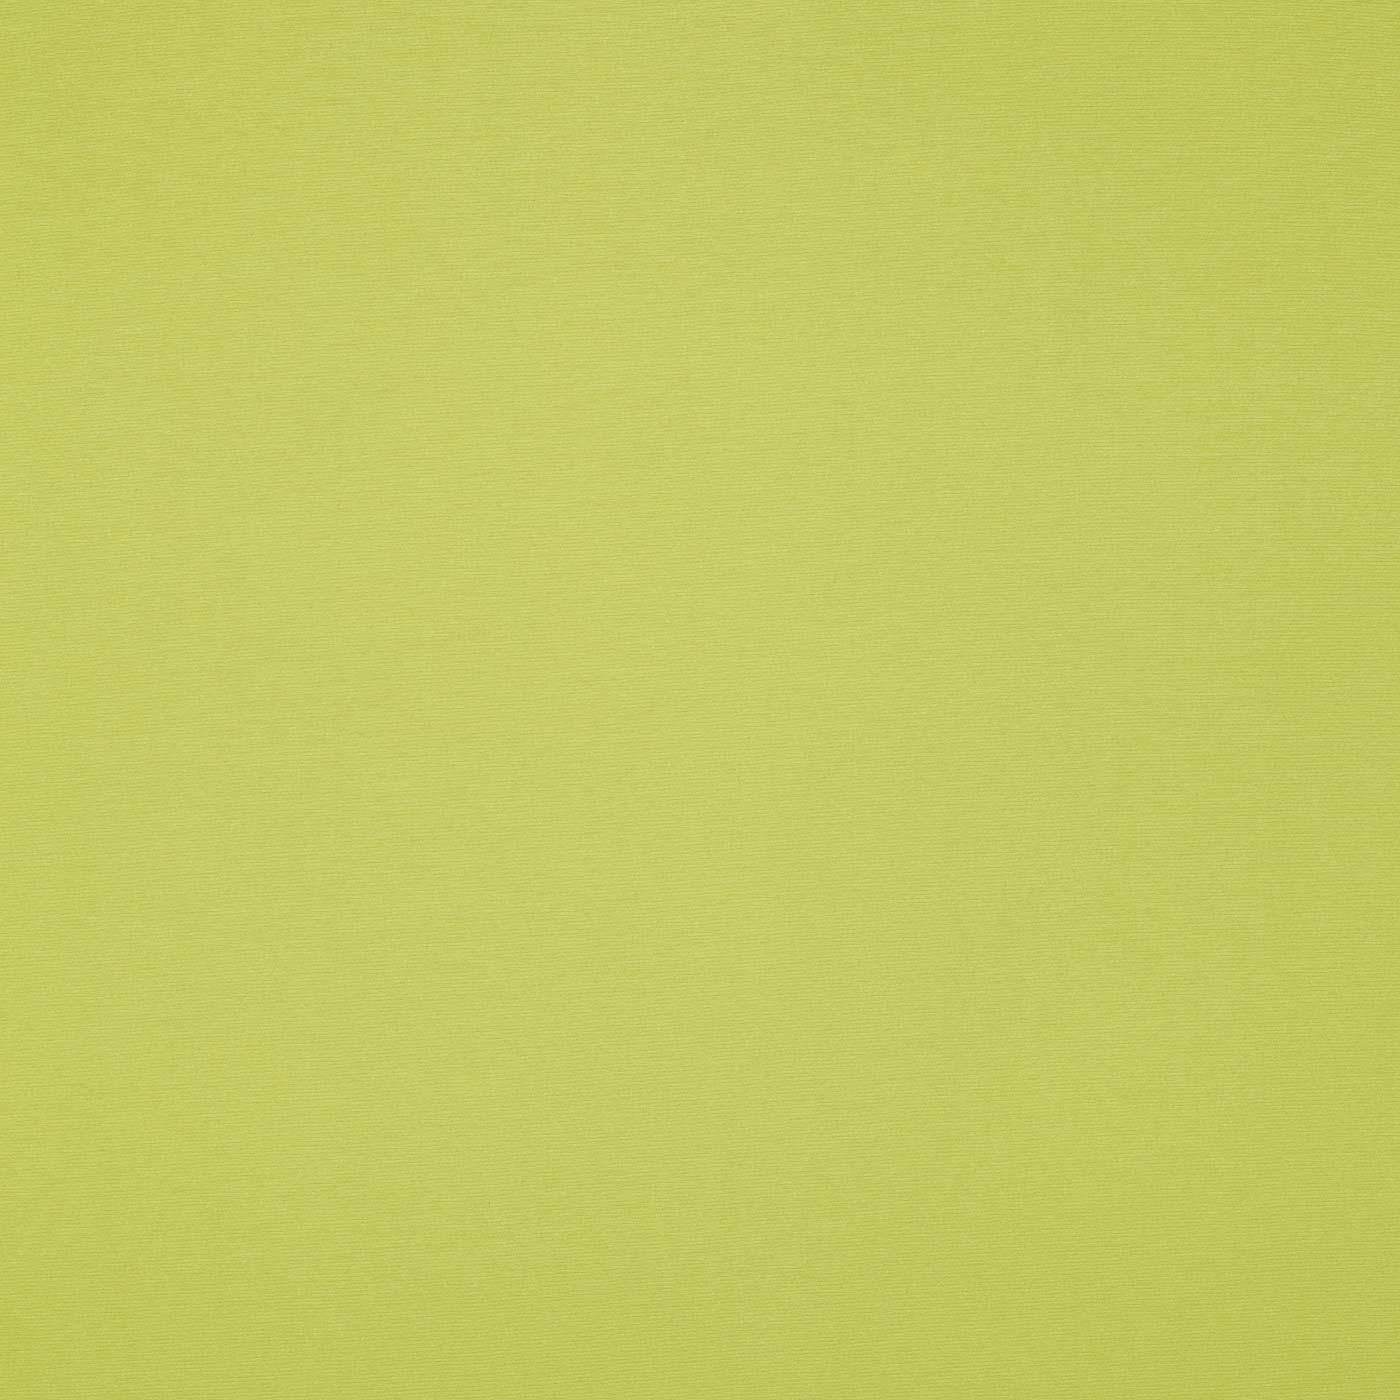 Union Lime